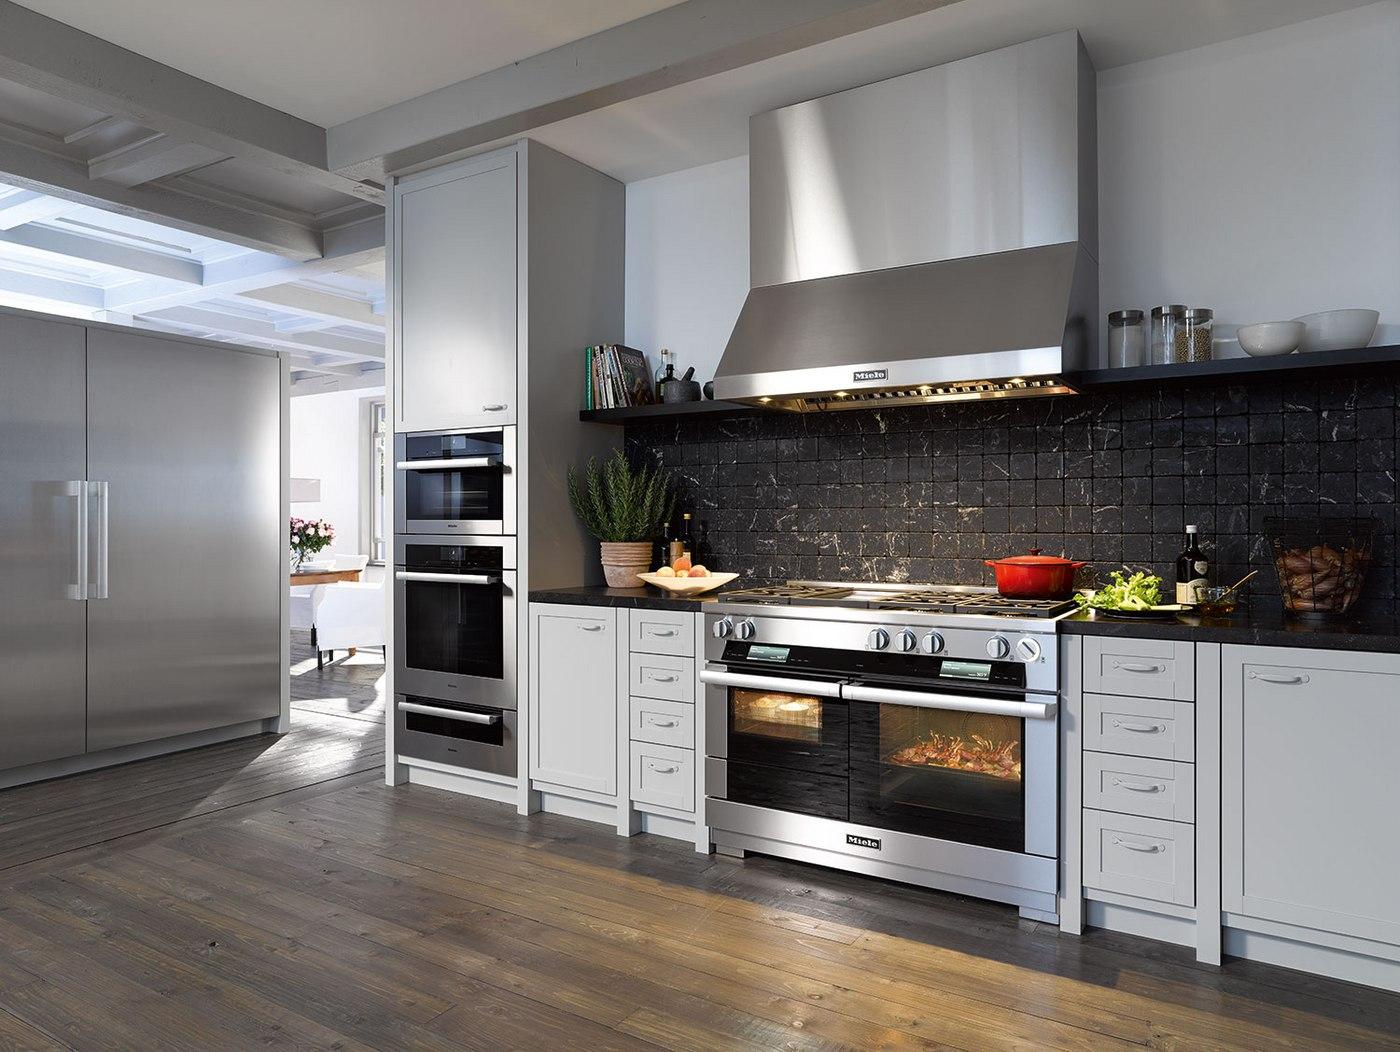 Uncategorized Kitchen Appliance Blogs most reliable least serviced appliance brands of 2016 reviews miele appliances 2017